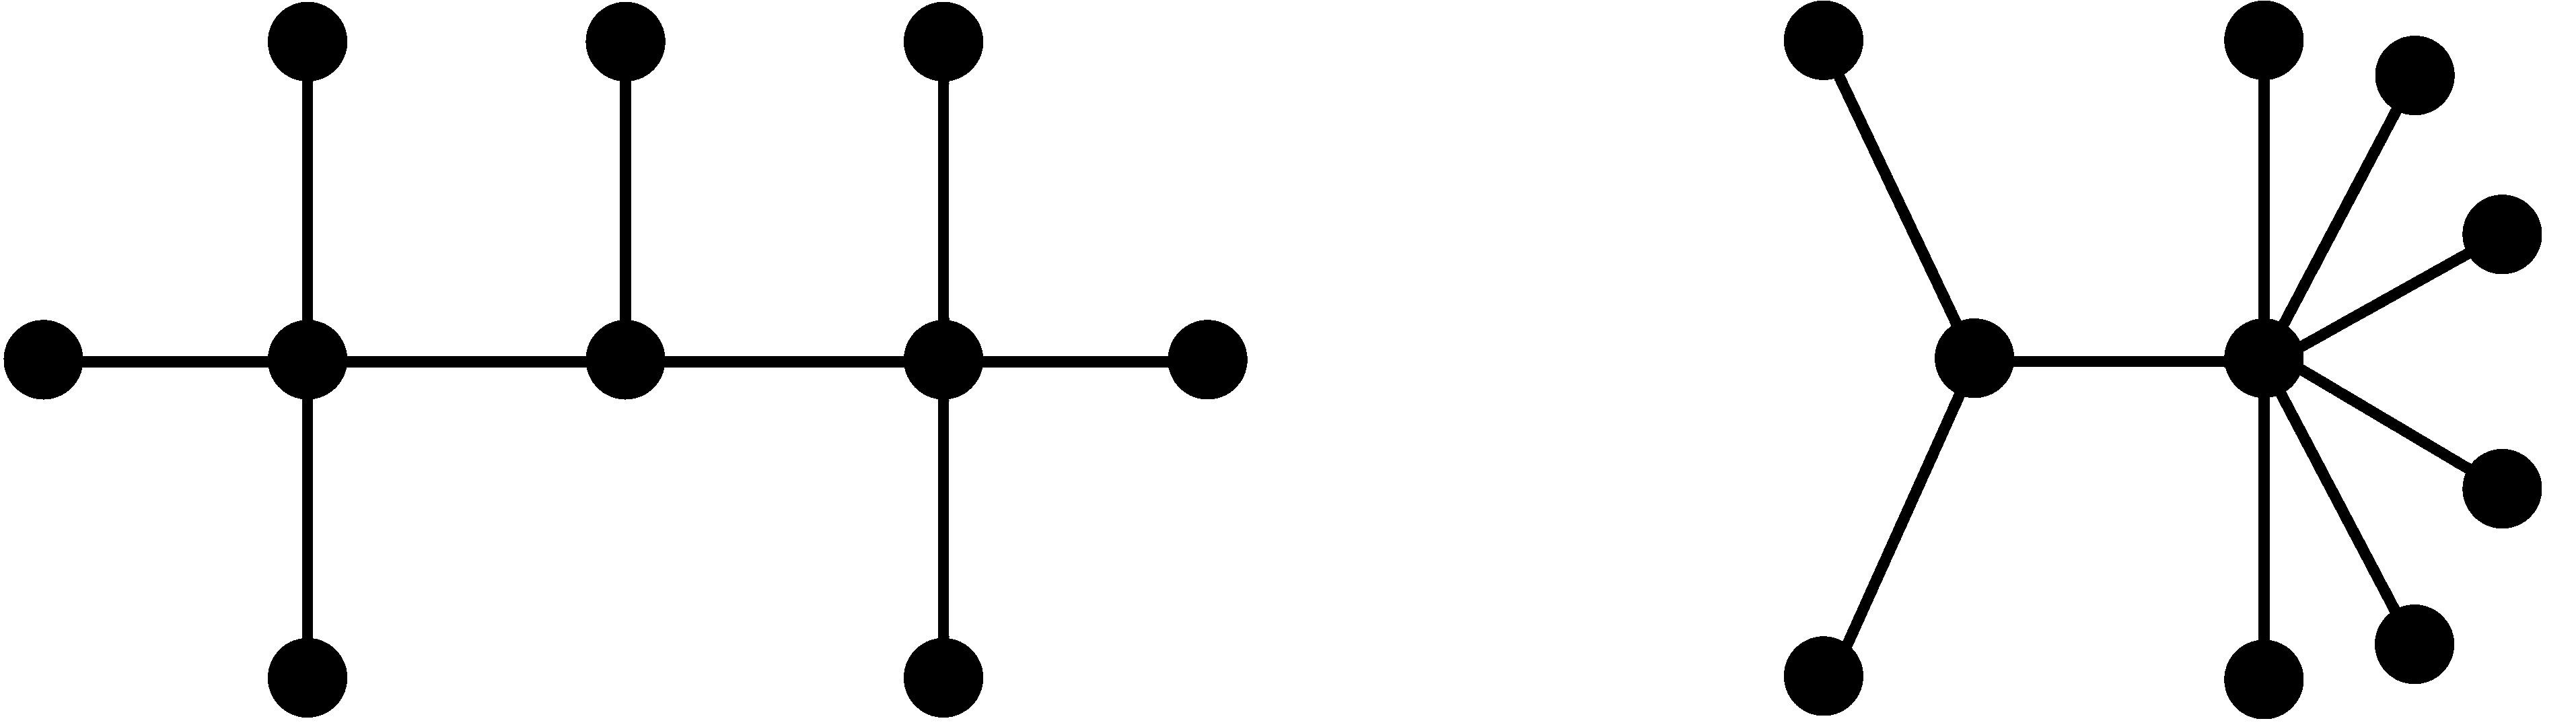 homeom_irred_graf.jpg